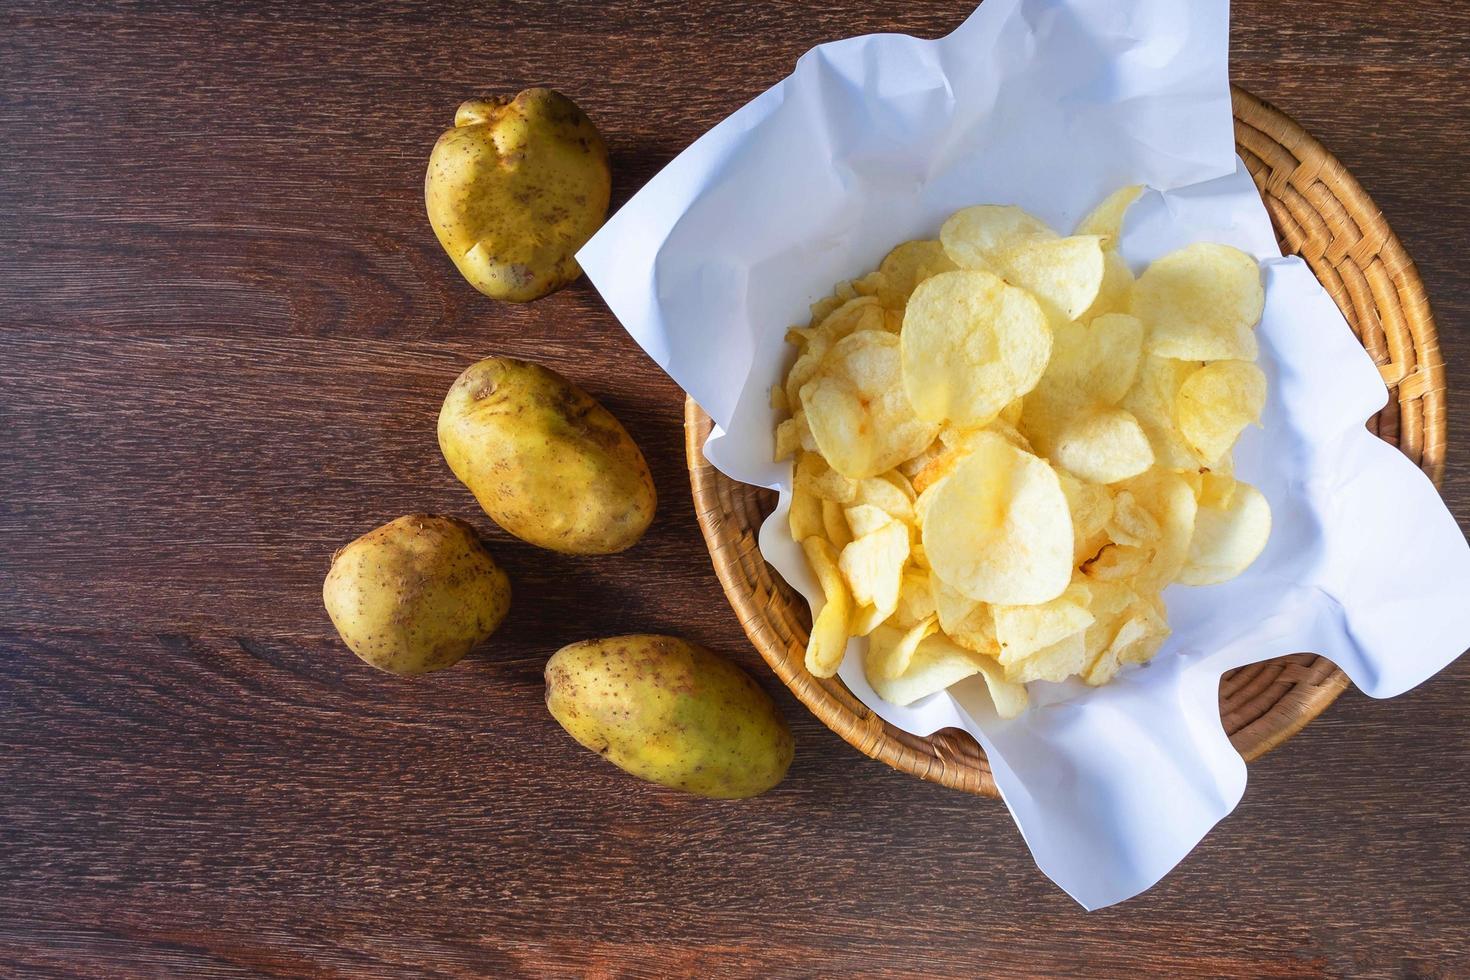 Fried potato chips in basket photo